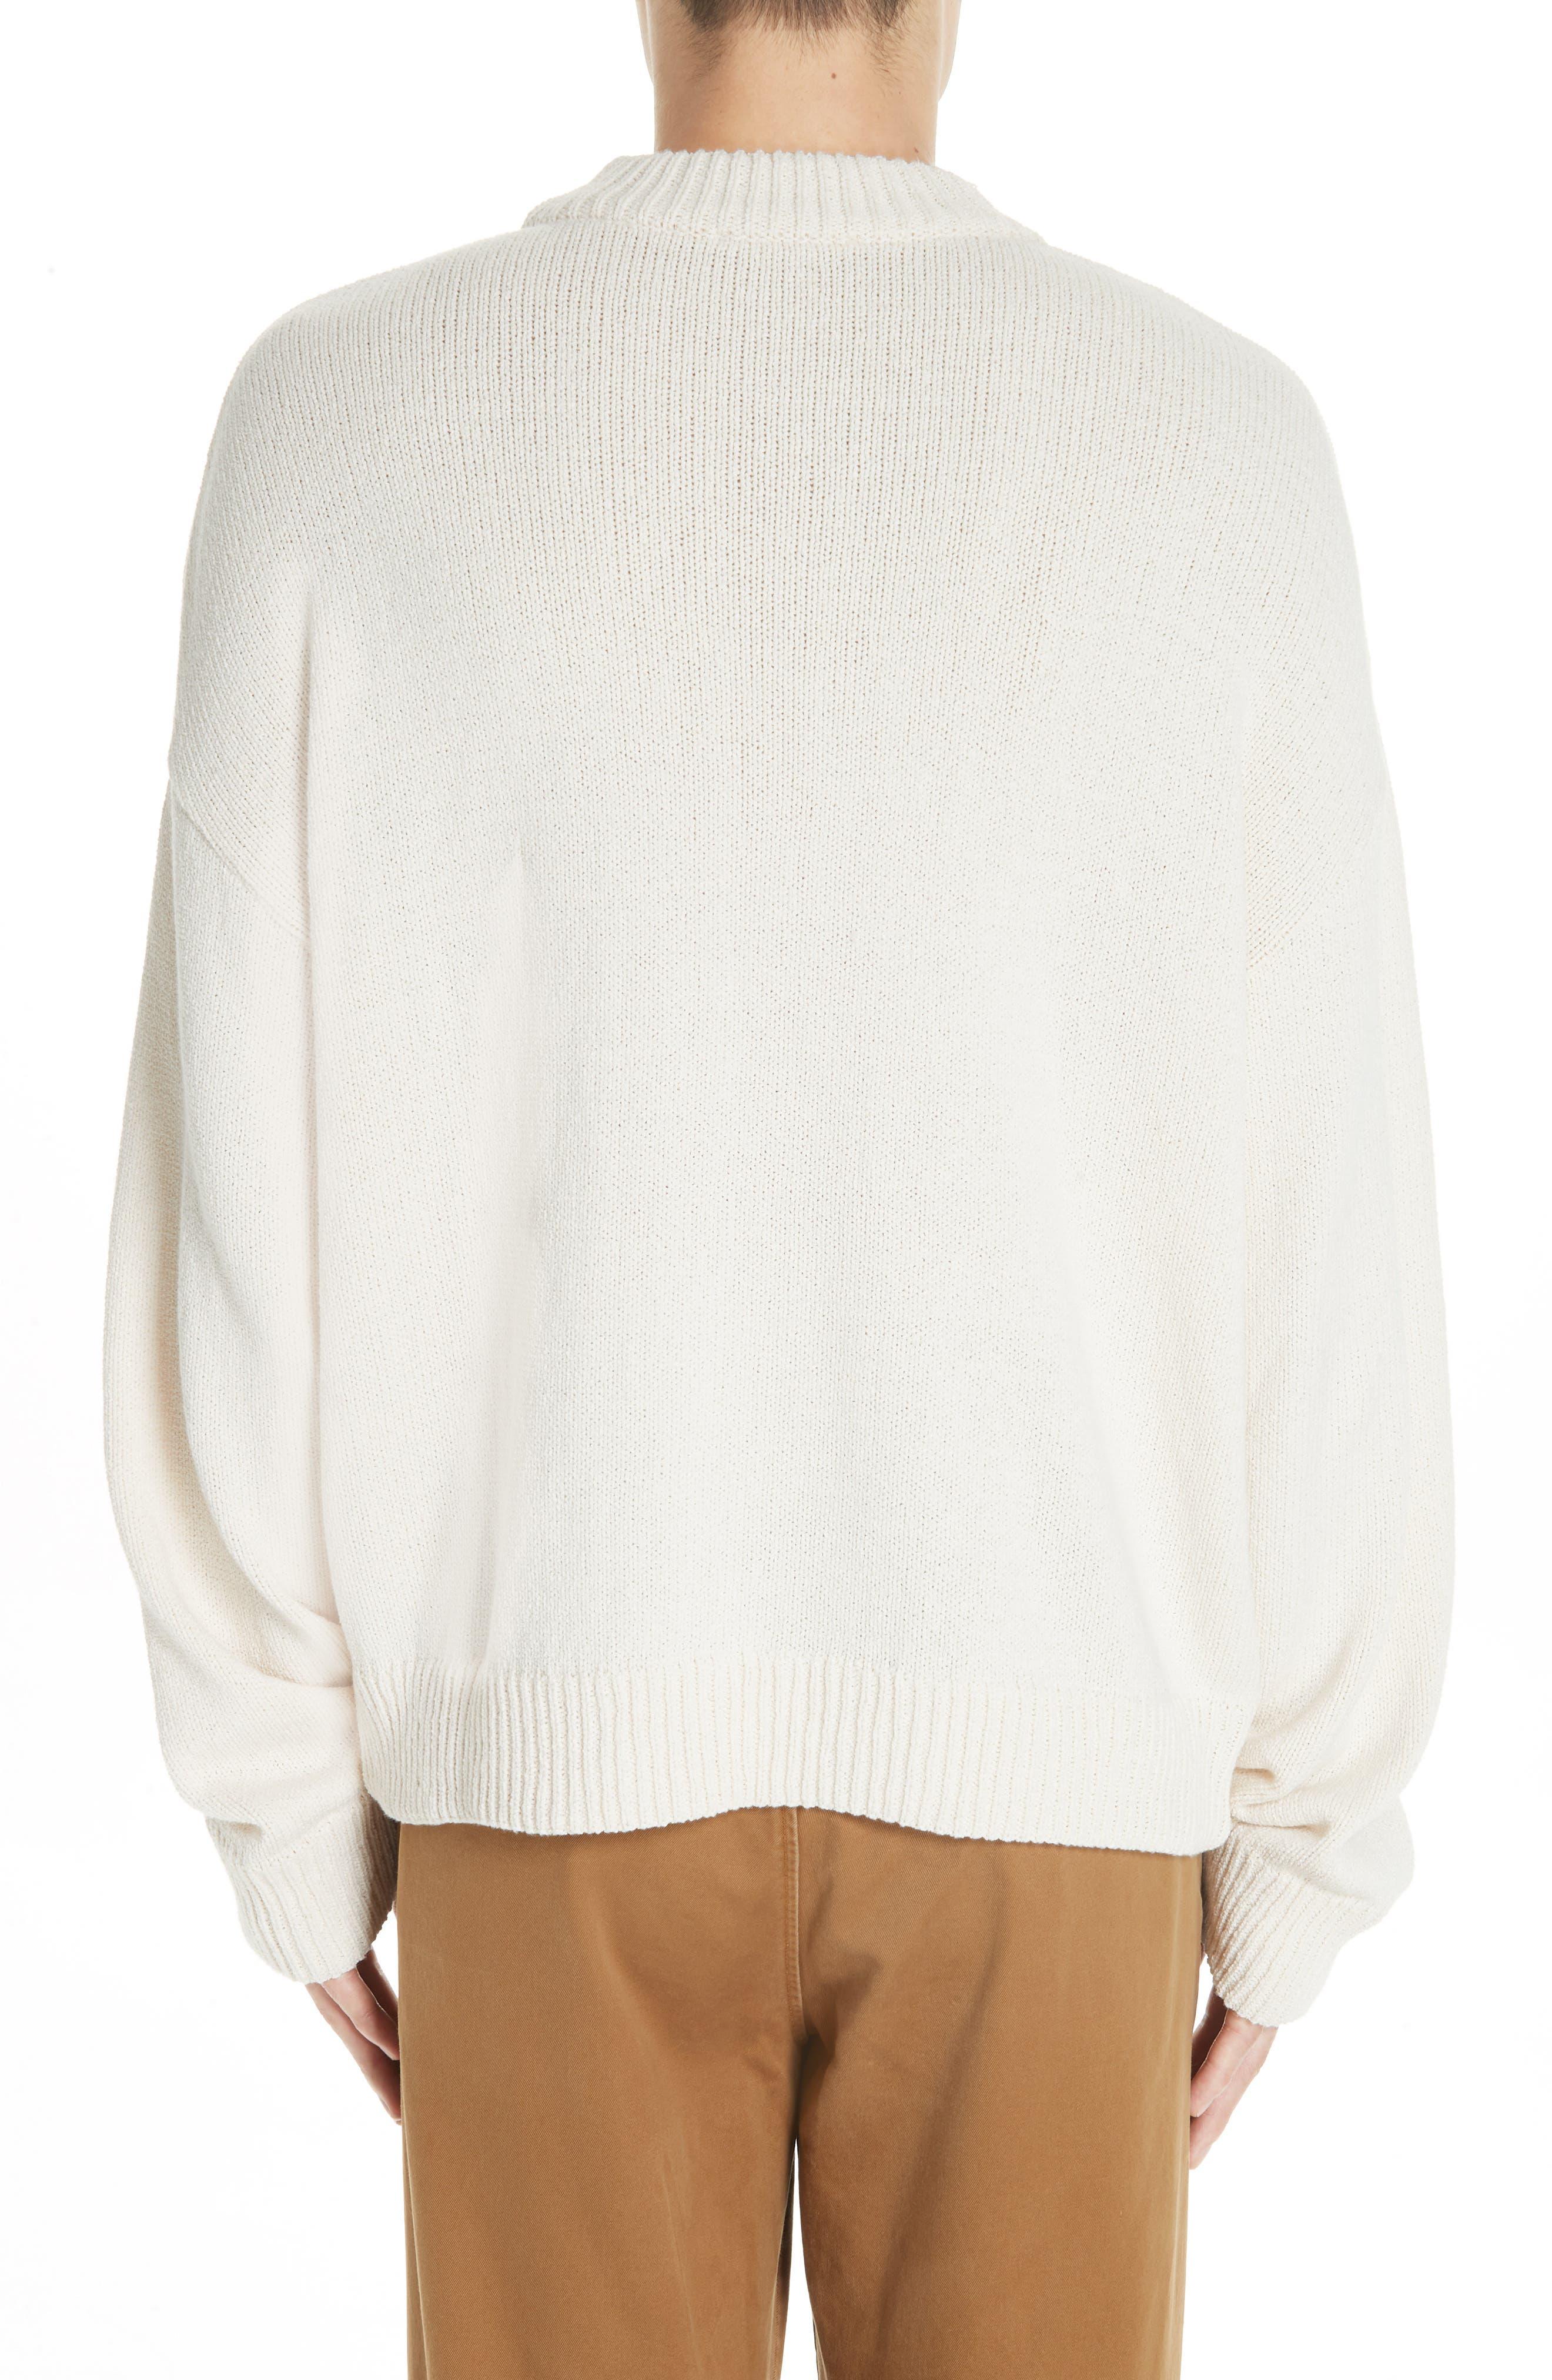 Somar Oversized Crewneck Sweater,                             Alternate thumbnail 2, color,                             100